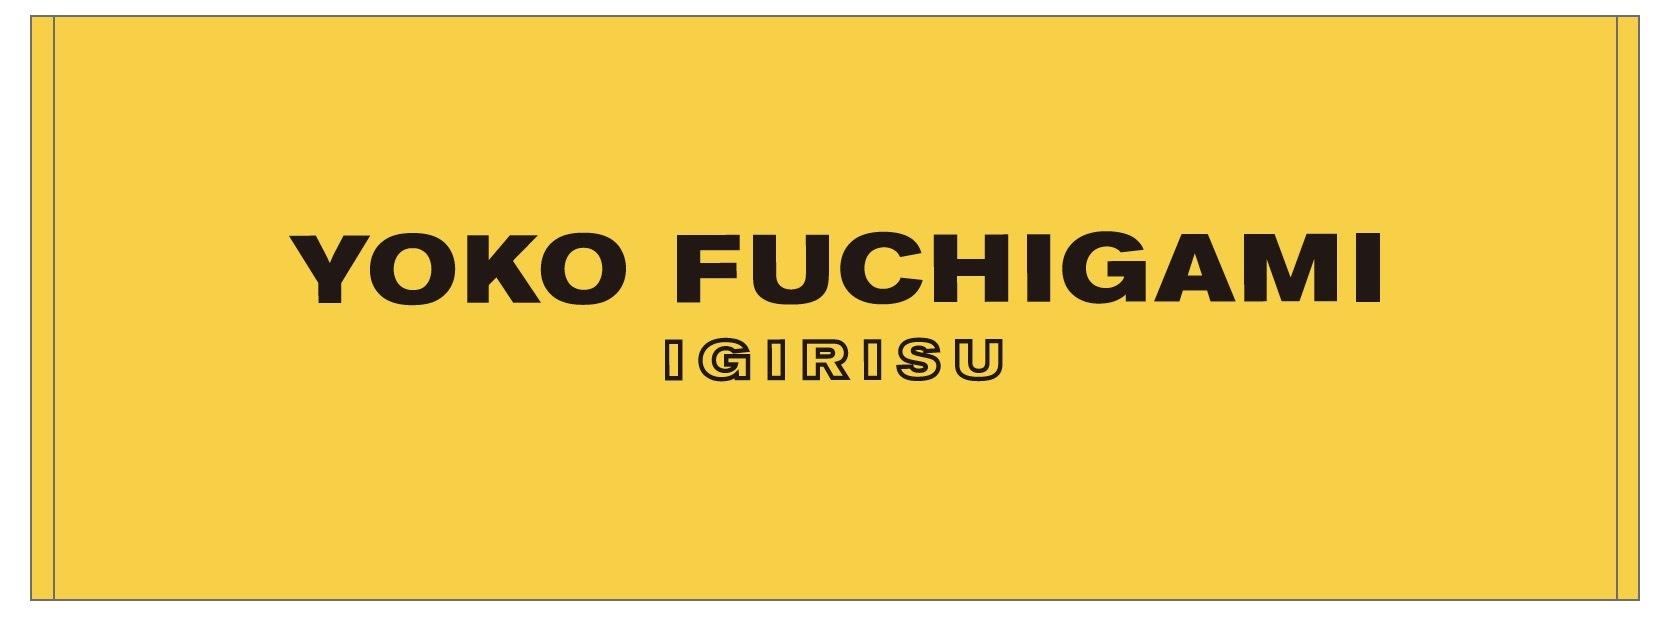 ★YOKO FUCHIGAMI STORE オリジナルスポーツタオル 2,592円